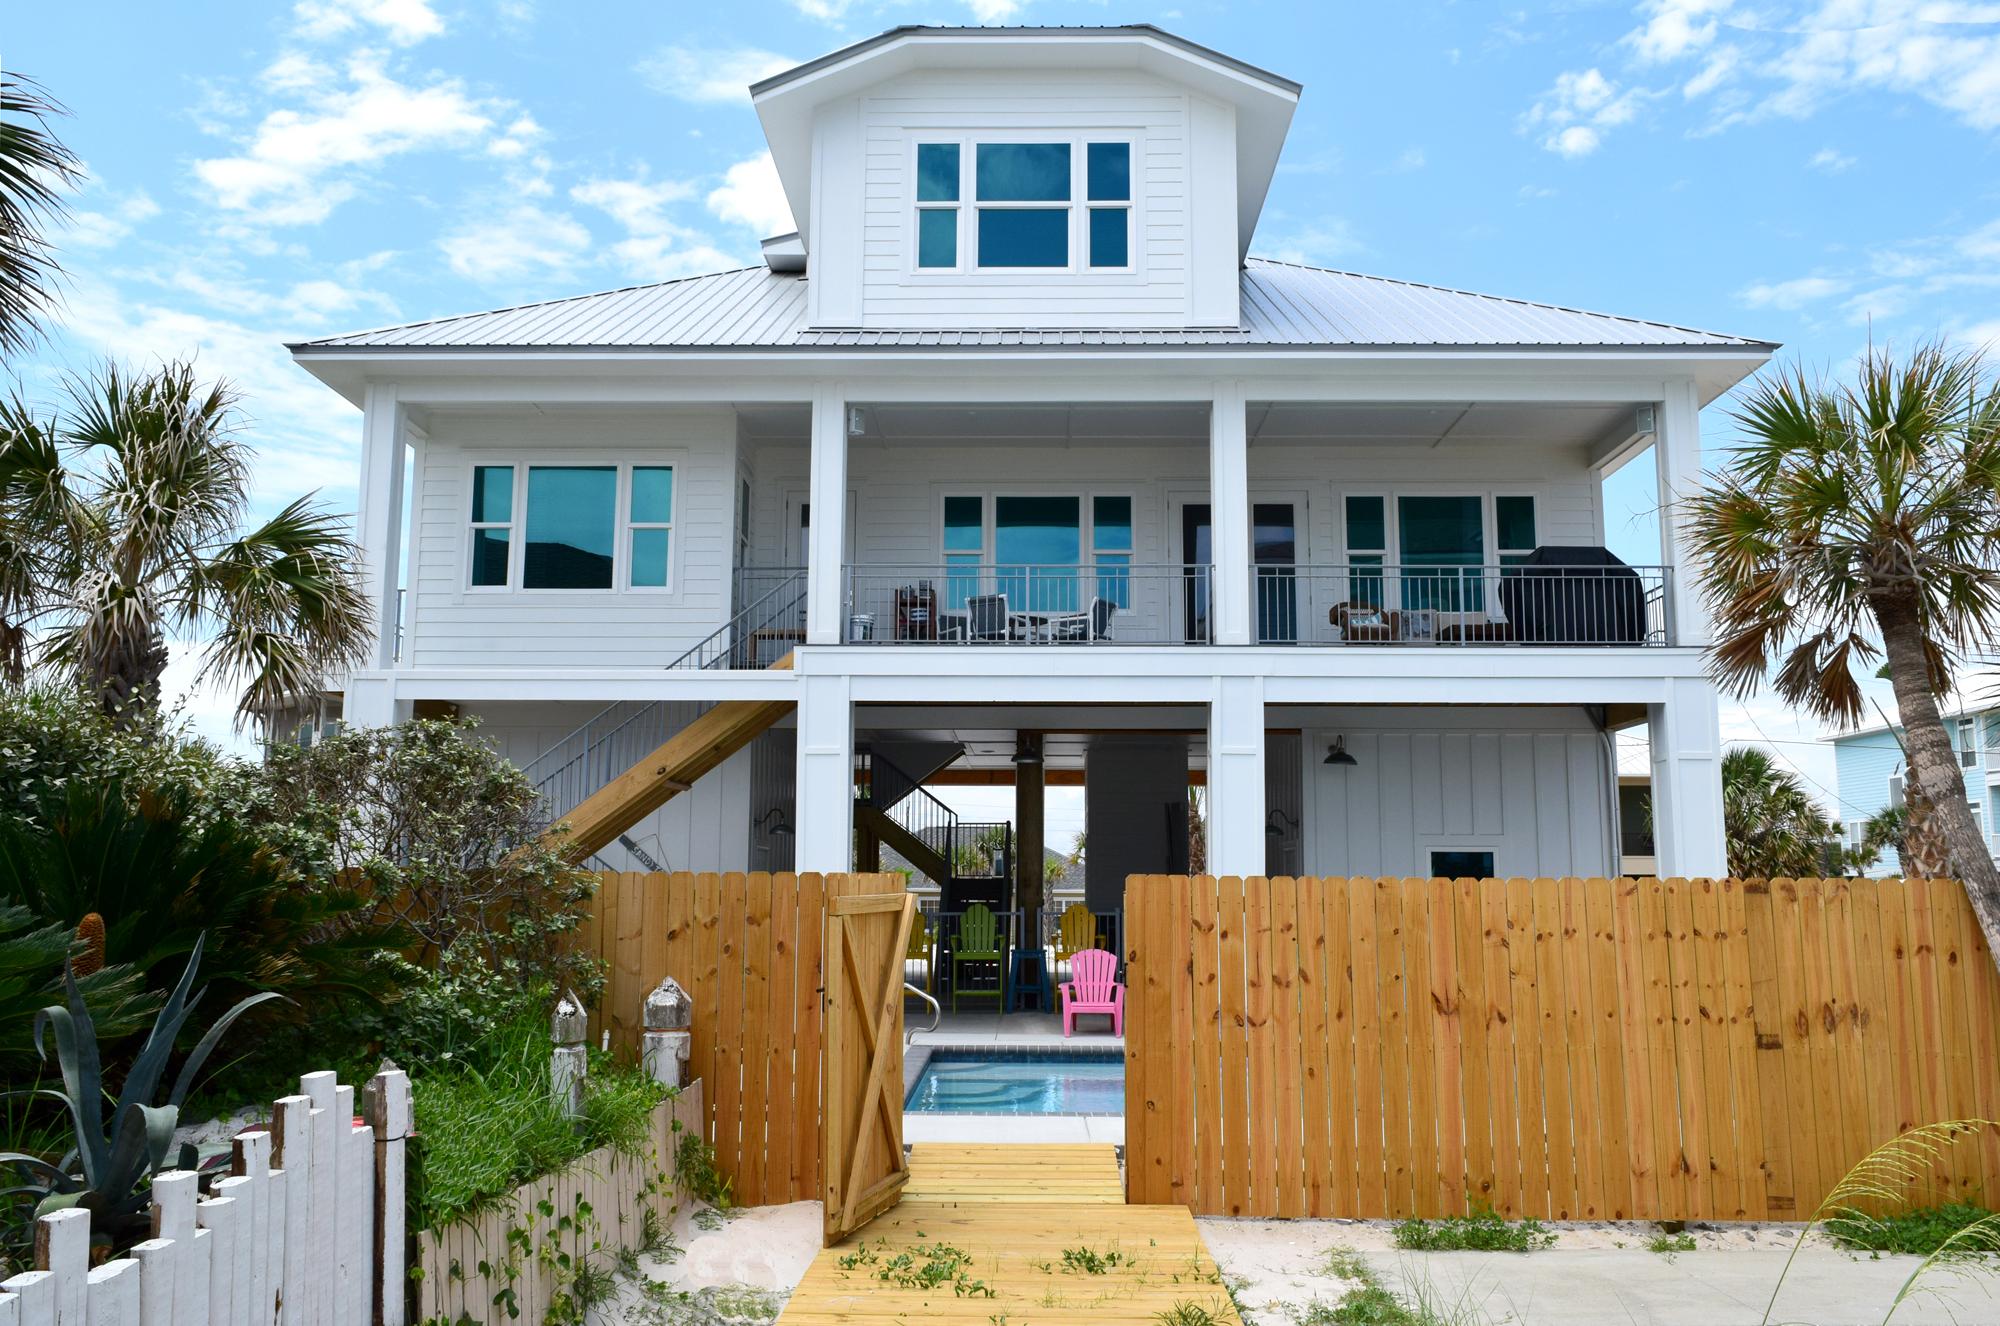 Ariola 204 House/Cottage rental in Pensacola Beach House Rentals in Pensacola Beach Florida - #1